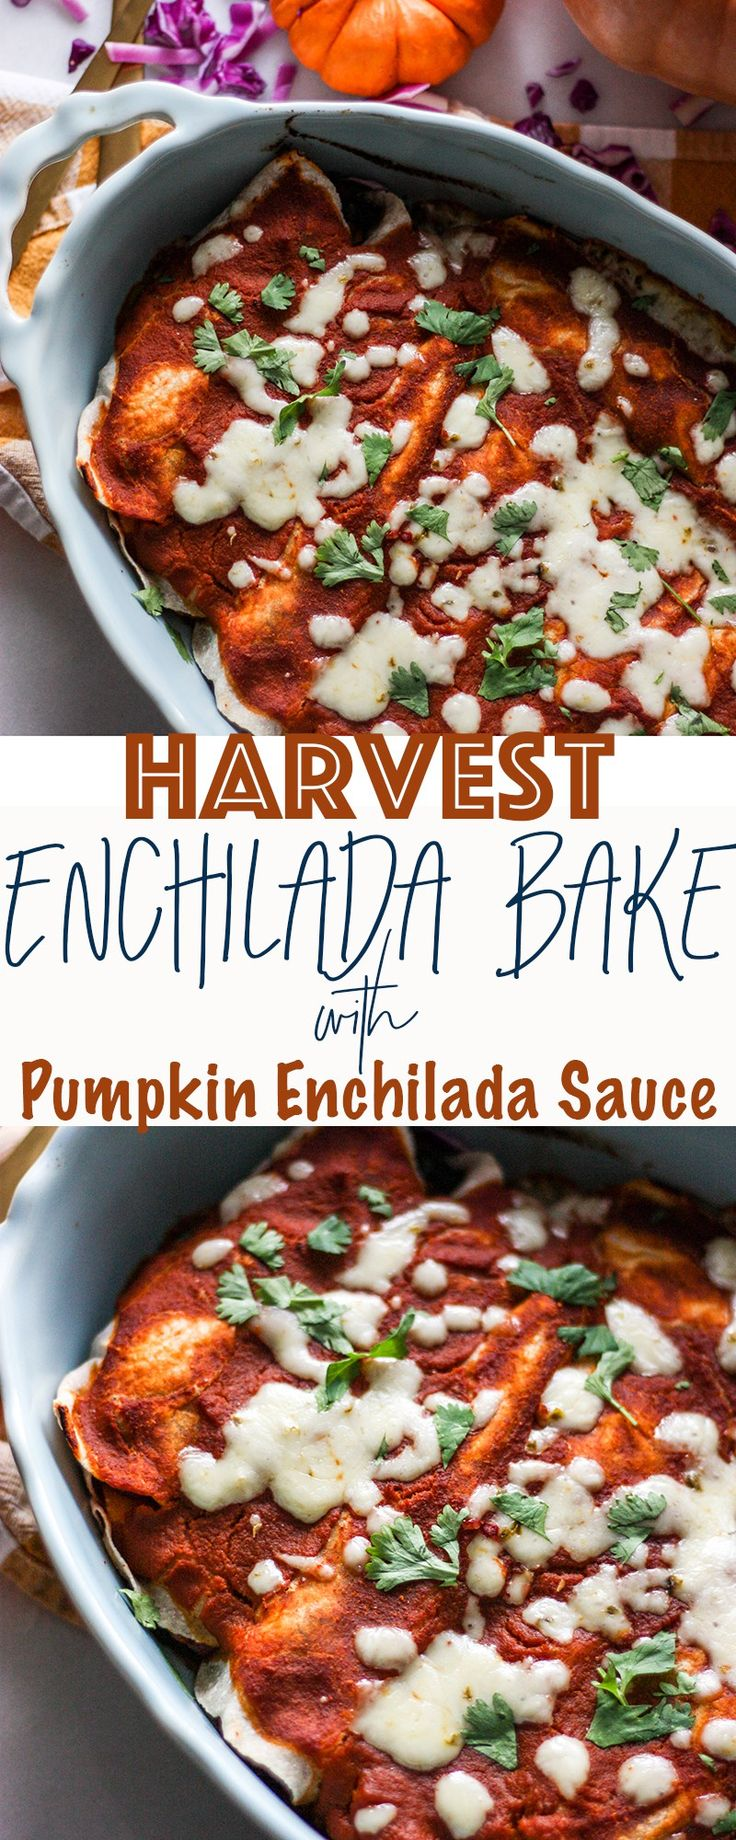 Harvest Turkey Enchiladas with Paleo Pumpkin Enchilada Sauce - a big batch enchilada recipe perfect for feeding a crowd - paleo option, gluten free option, dairy free option